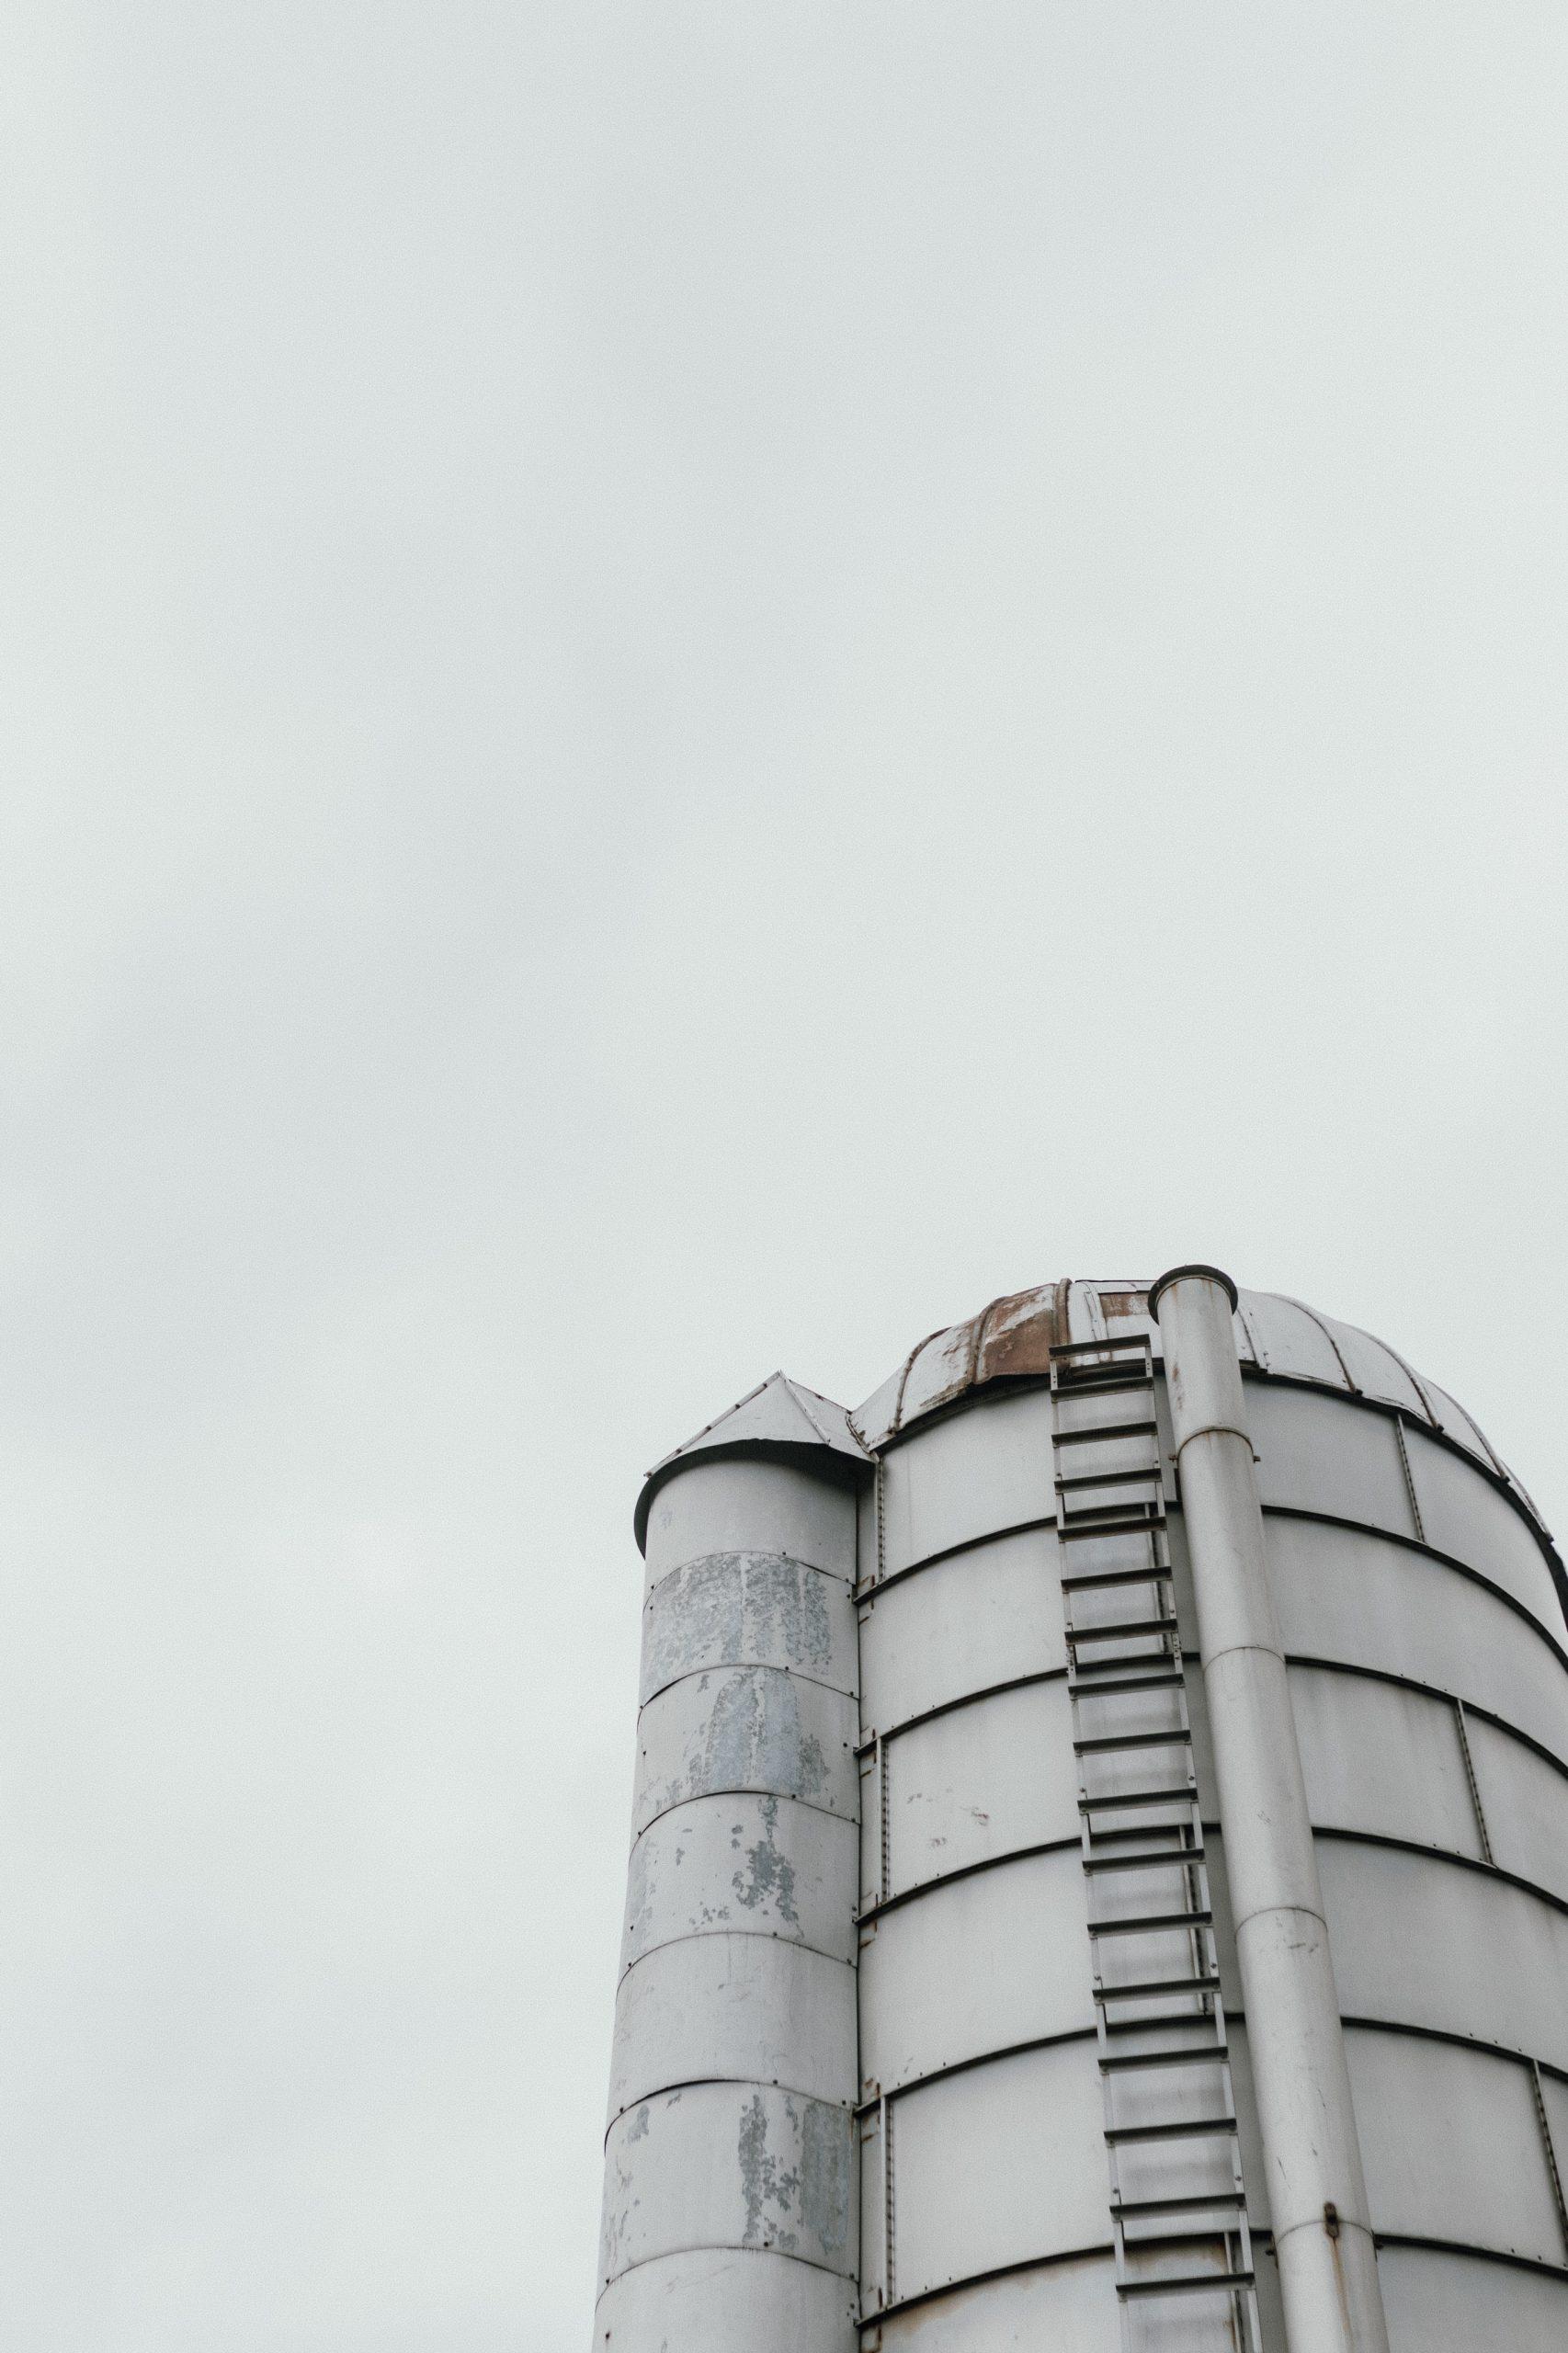 Publication pressures create knowledge silos